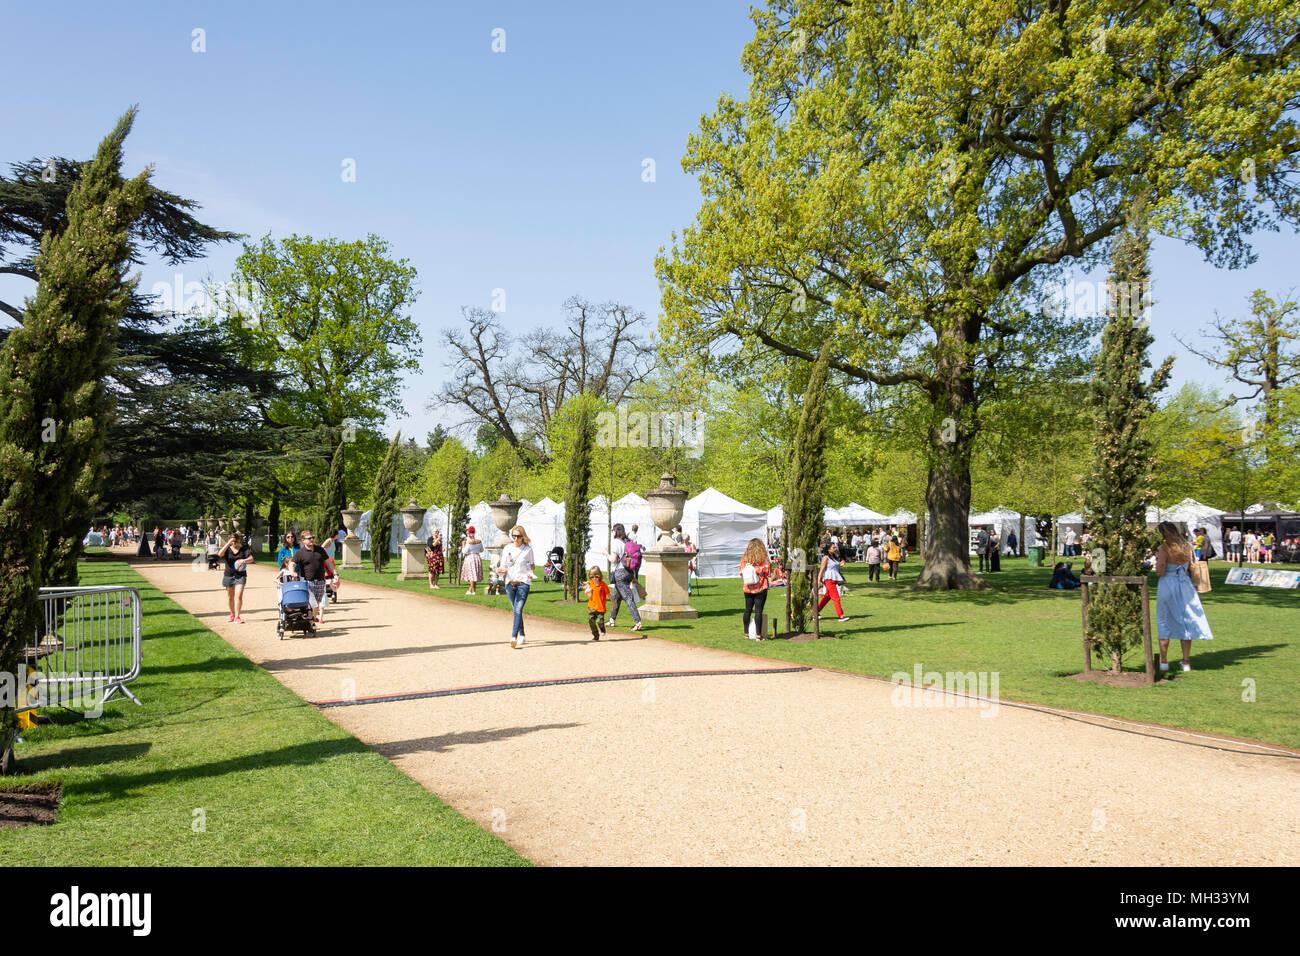 National Tea Day Fes.te.val in Chiswick House gardens, Burlington Lane, Chiswick, London Borough of Hounslow, Greater London, England, United Kingdom - Stock Image